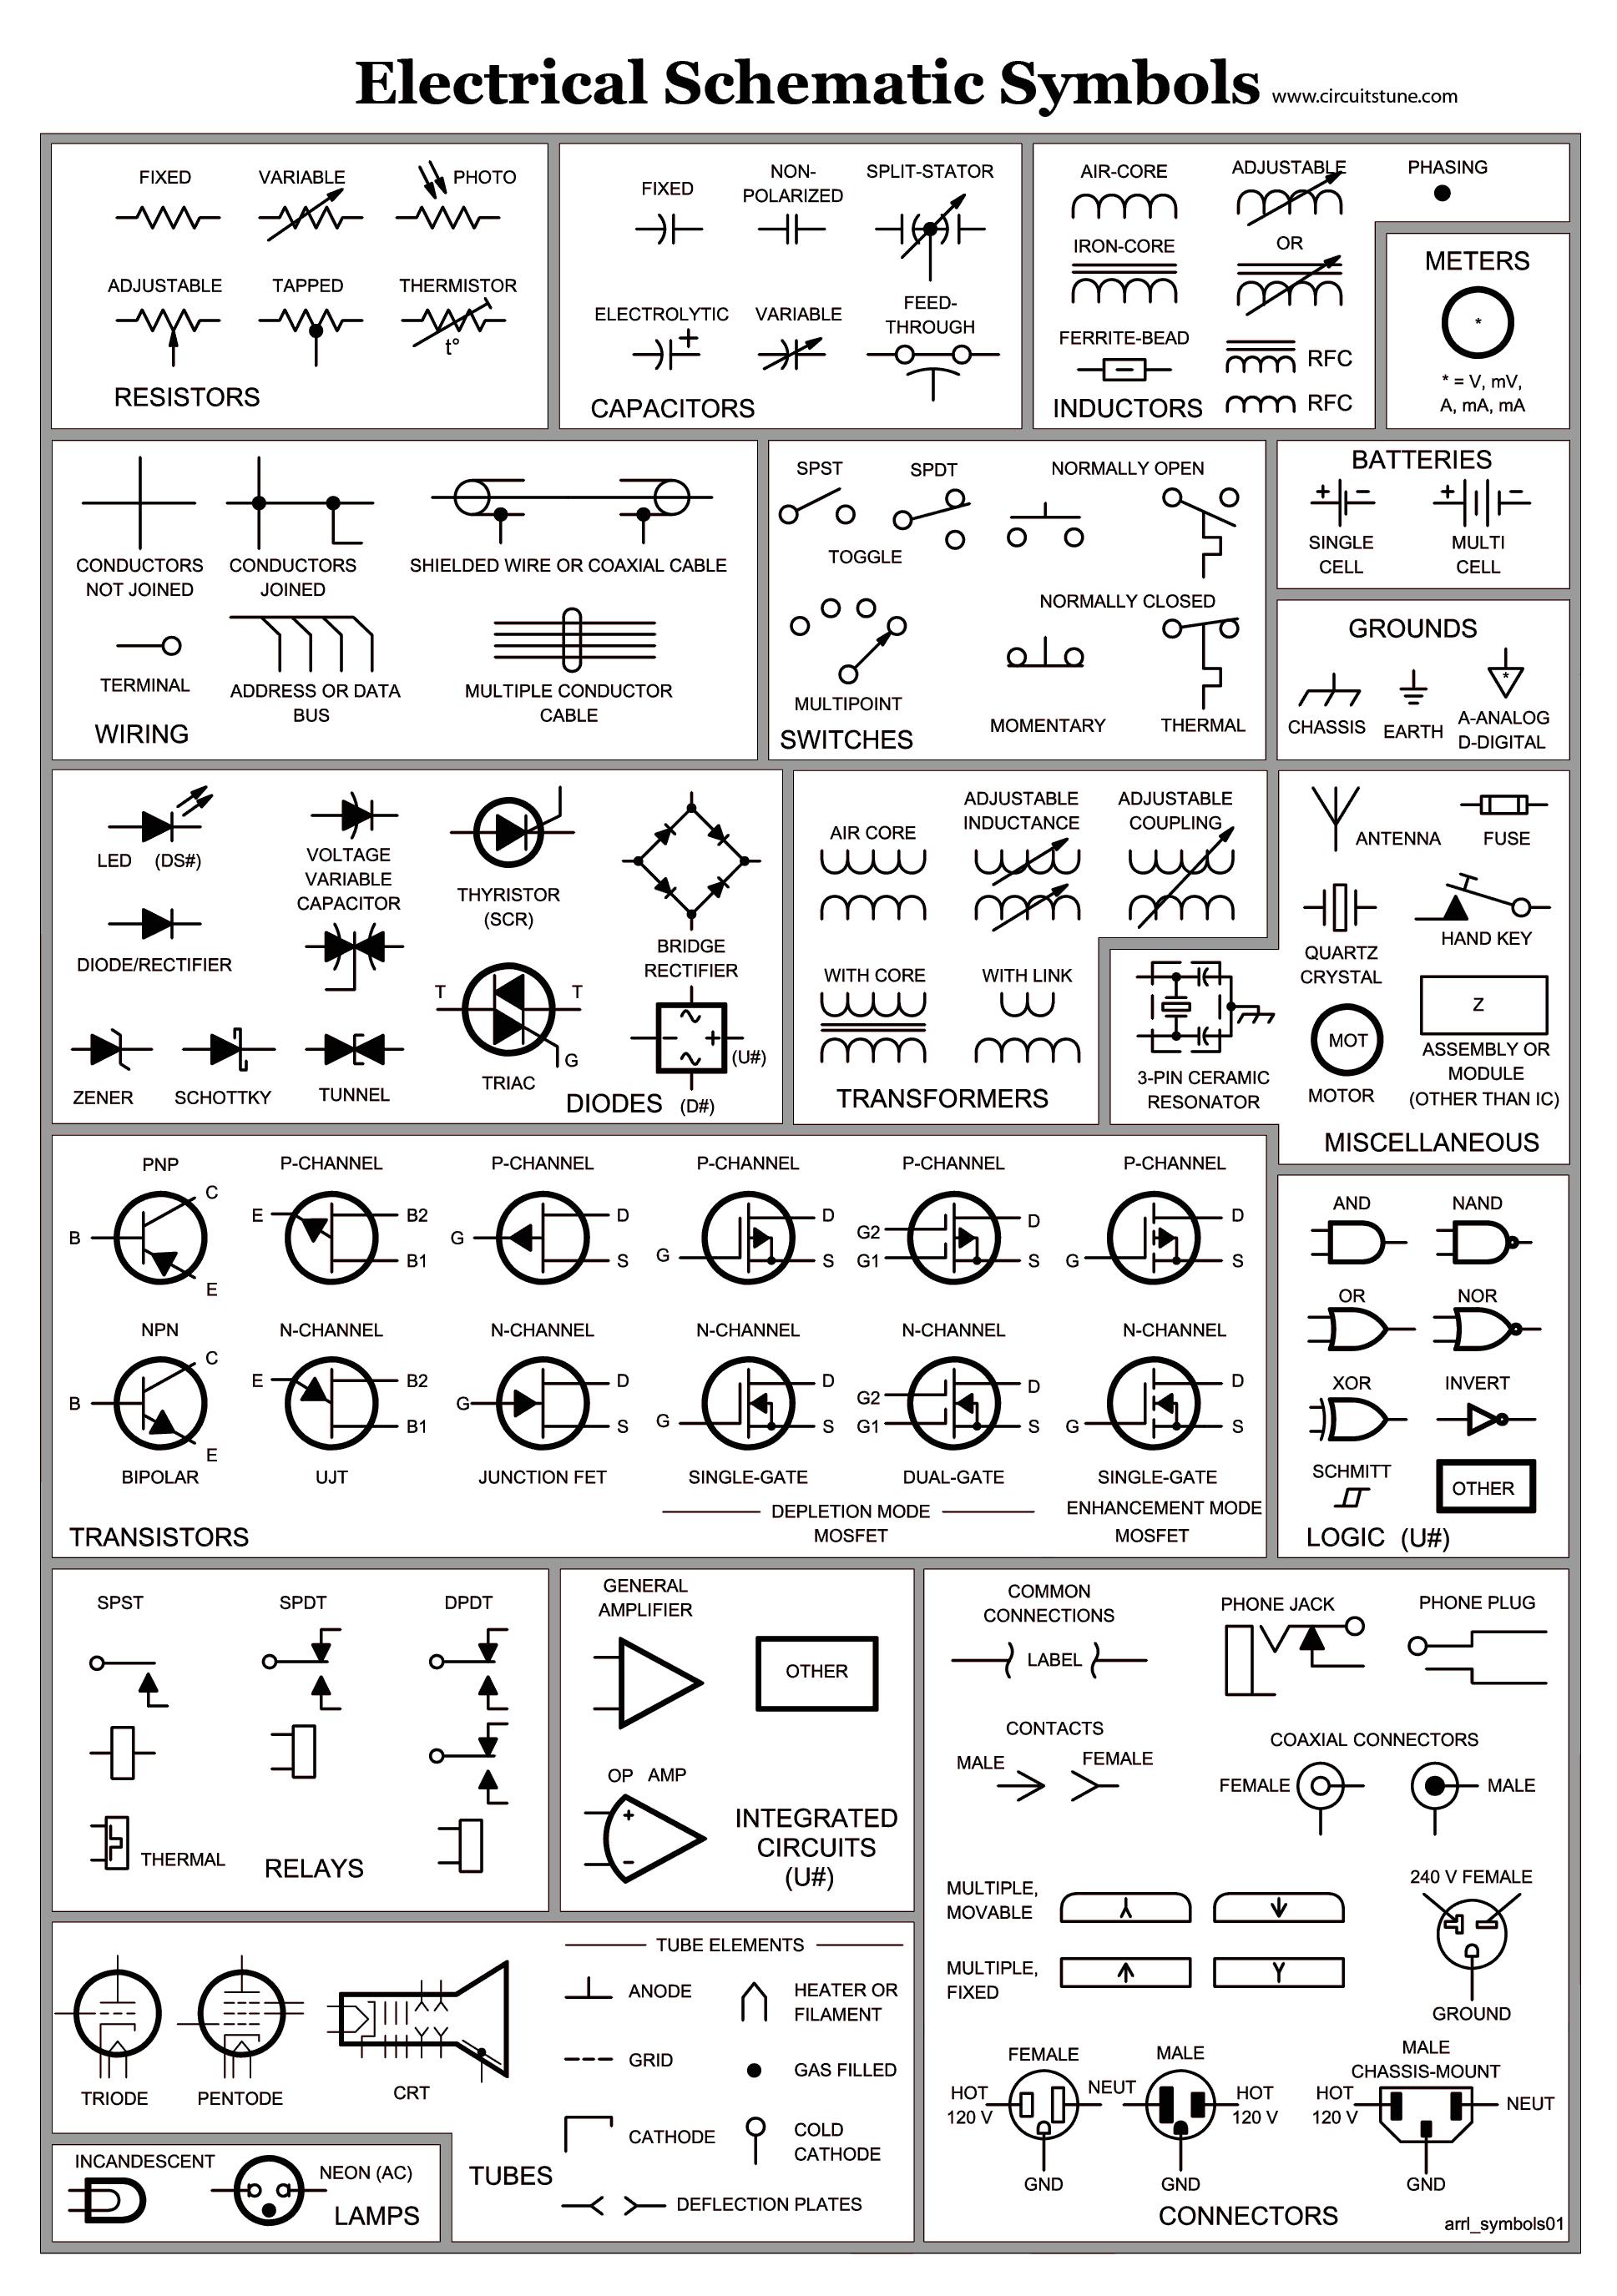 electrical schematic symbols skinsquiggles electrical symbols symbols and functions pdf schematic symbols used in arrl circuit